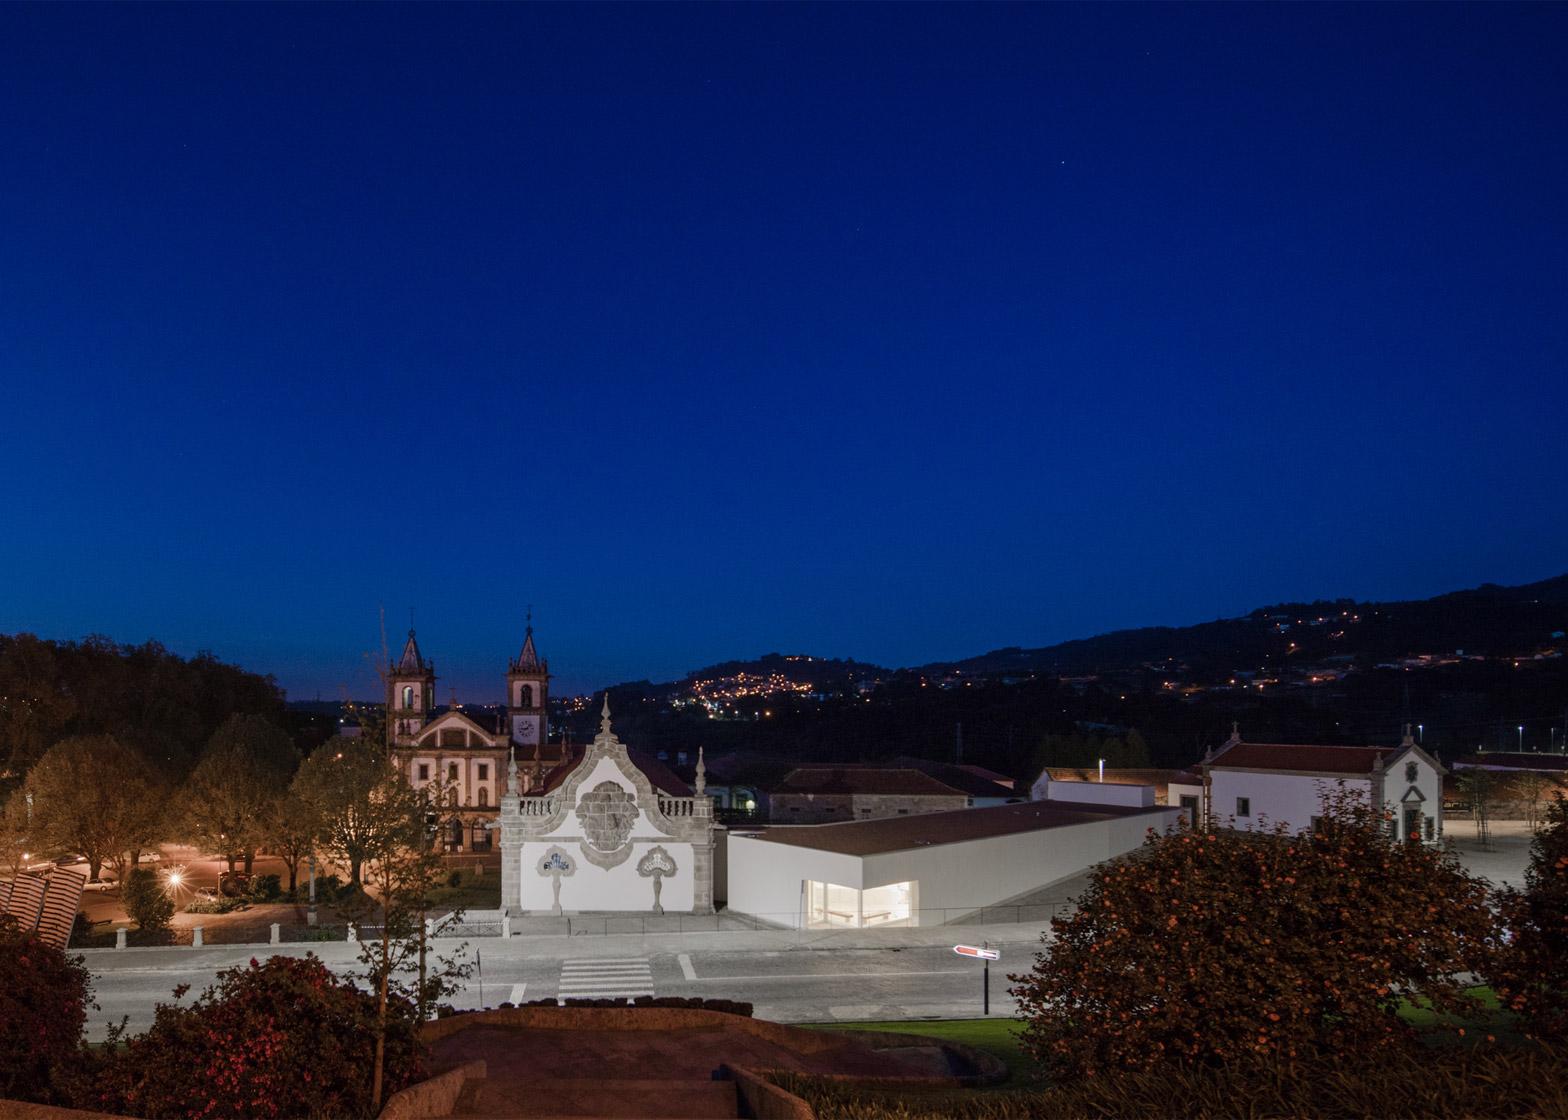 6-premiados-arquitetos-portugueses-se-unem-para-reformar-museu